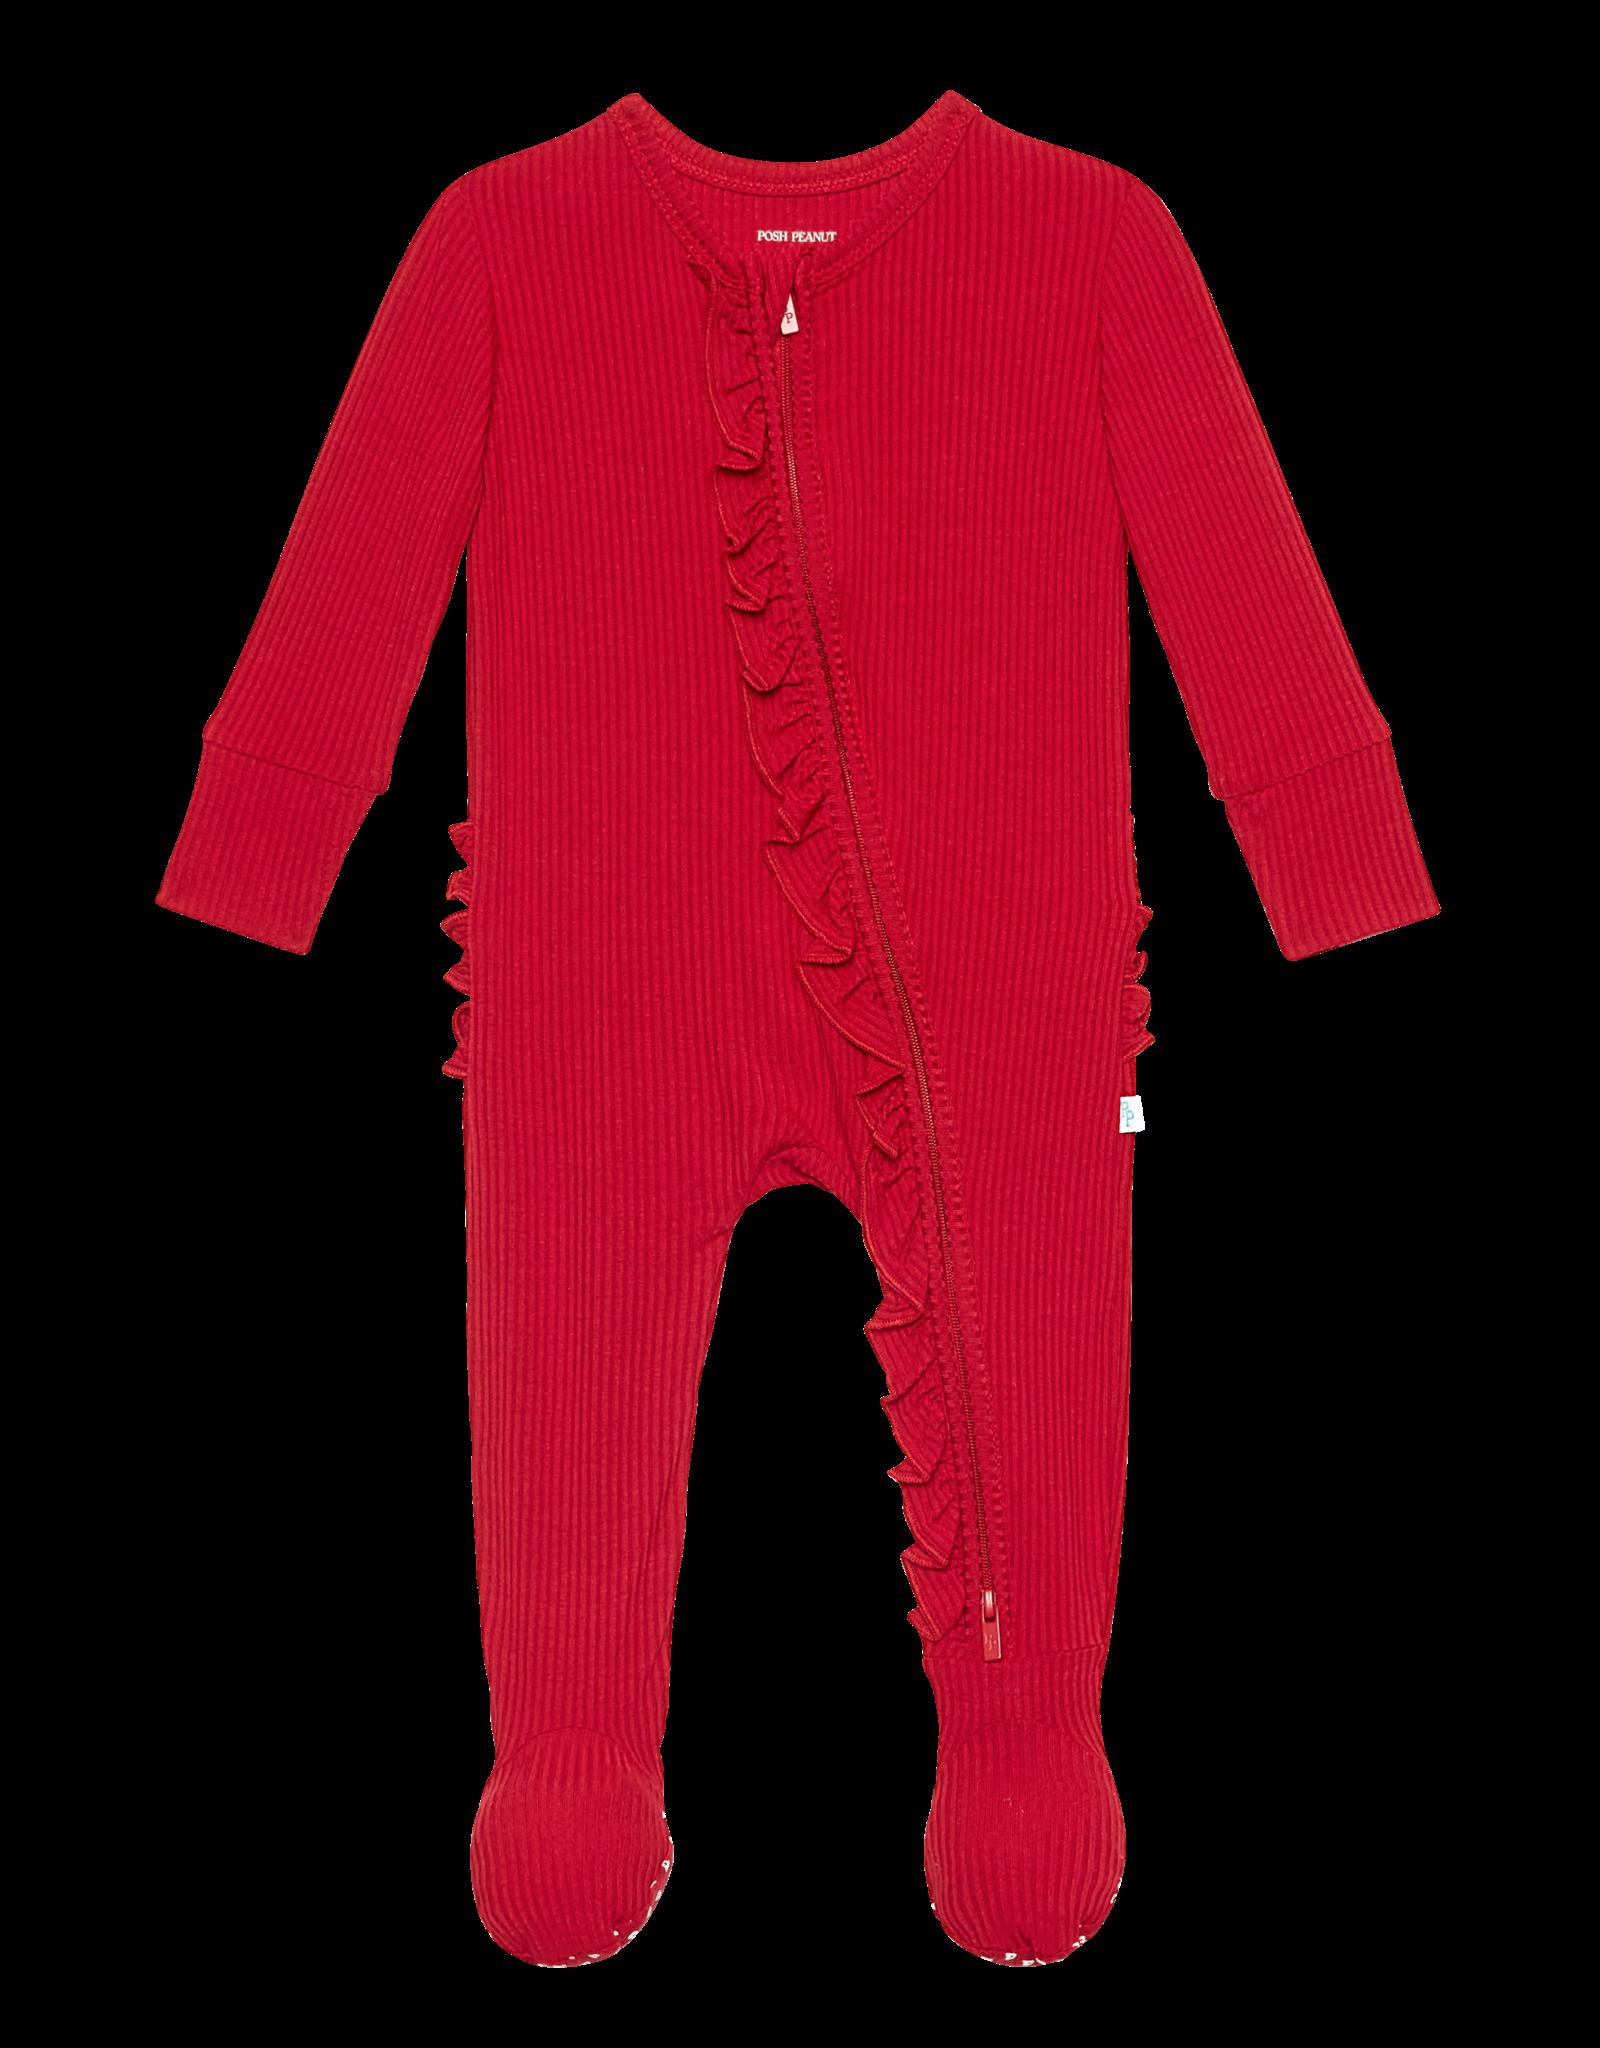 Crimson Ribbed - Zippered Ruffled Footie